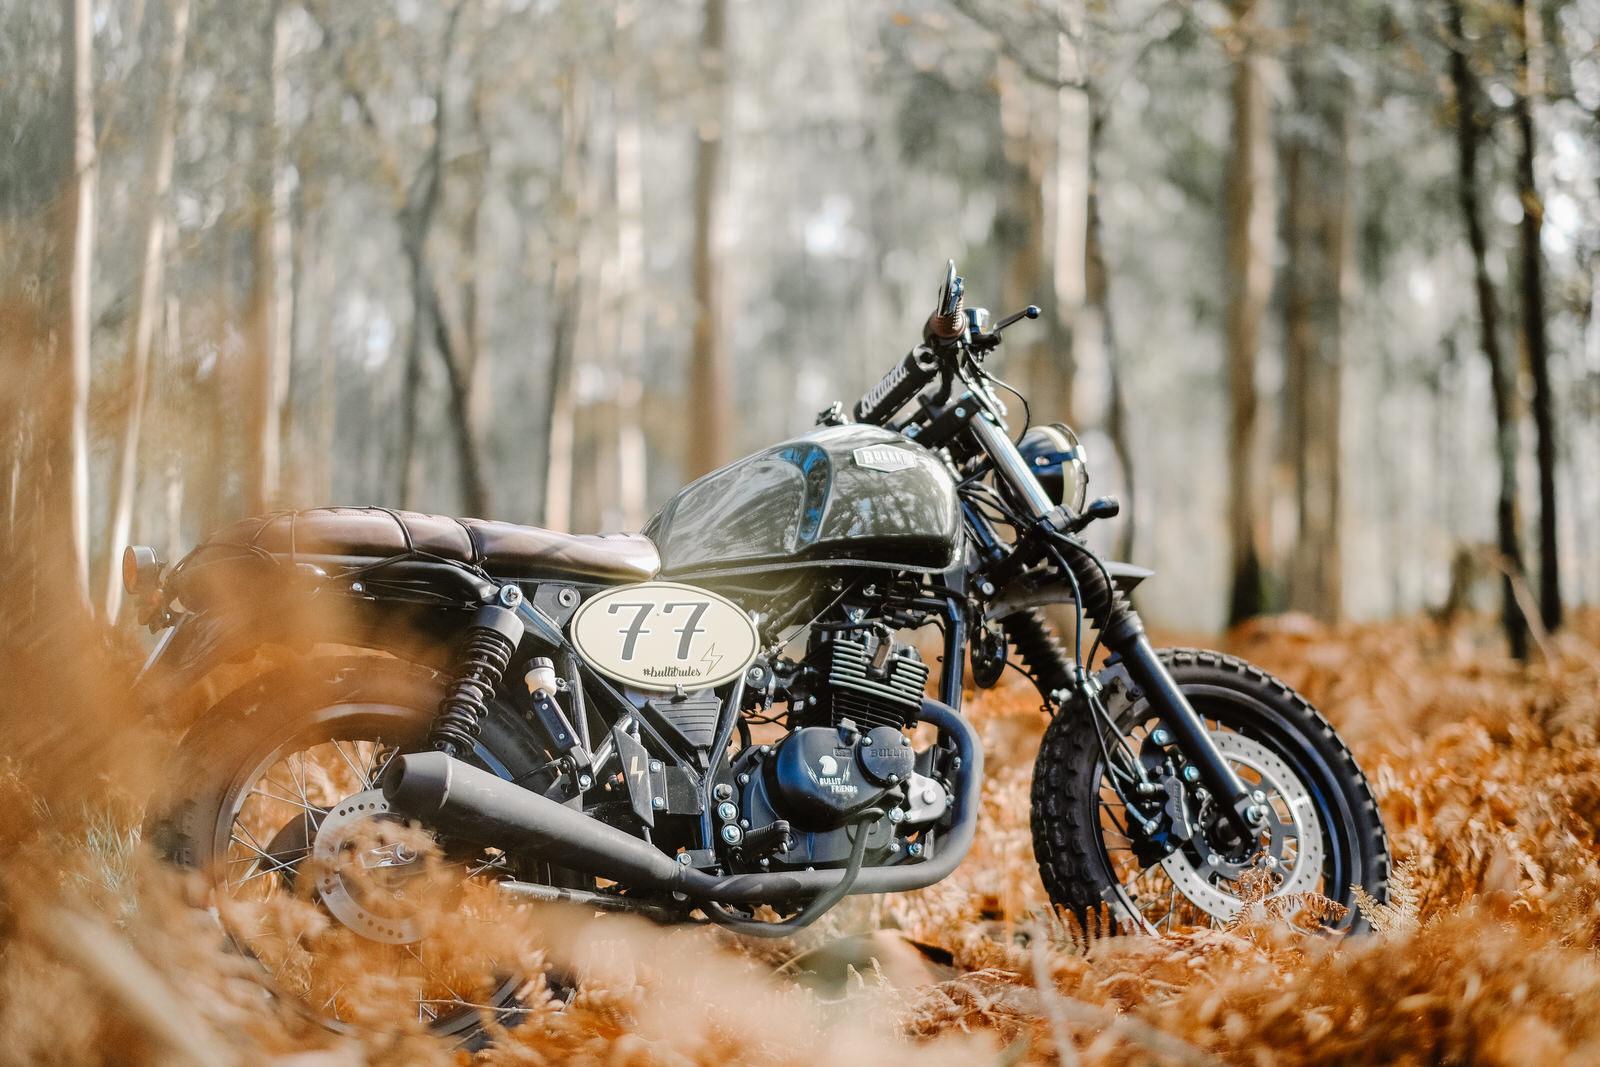 Motorcycles Bullit Brixton mutt mash fotógrafo motas costom Porto Portugal